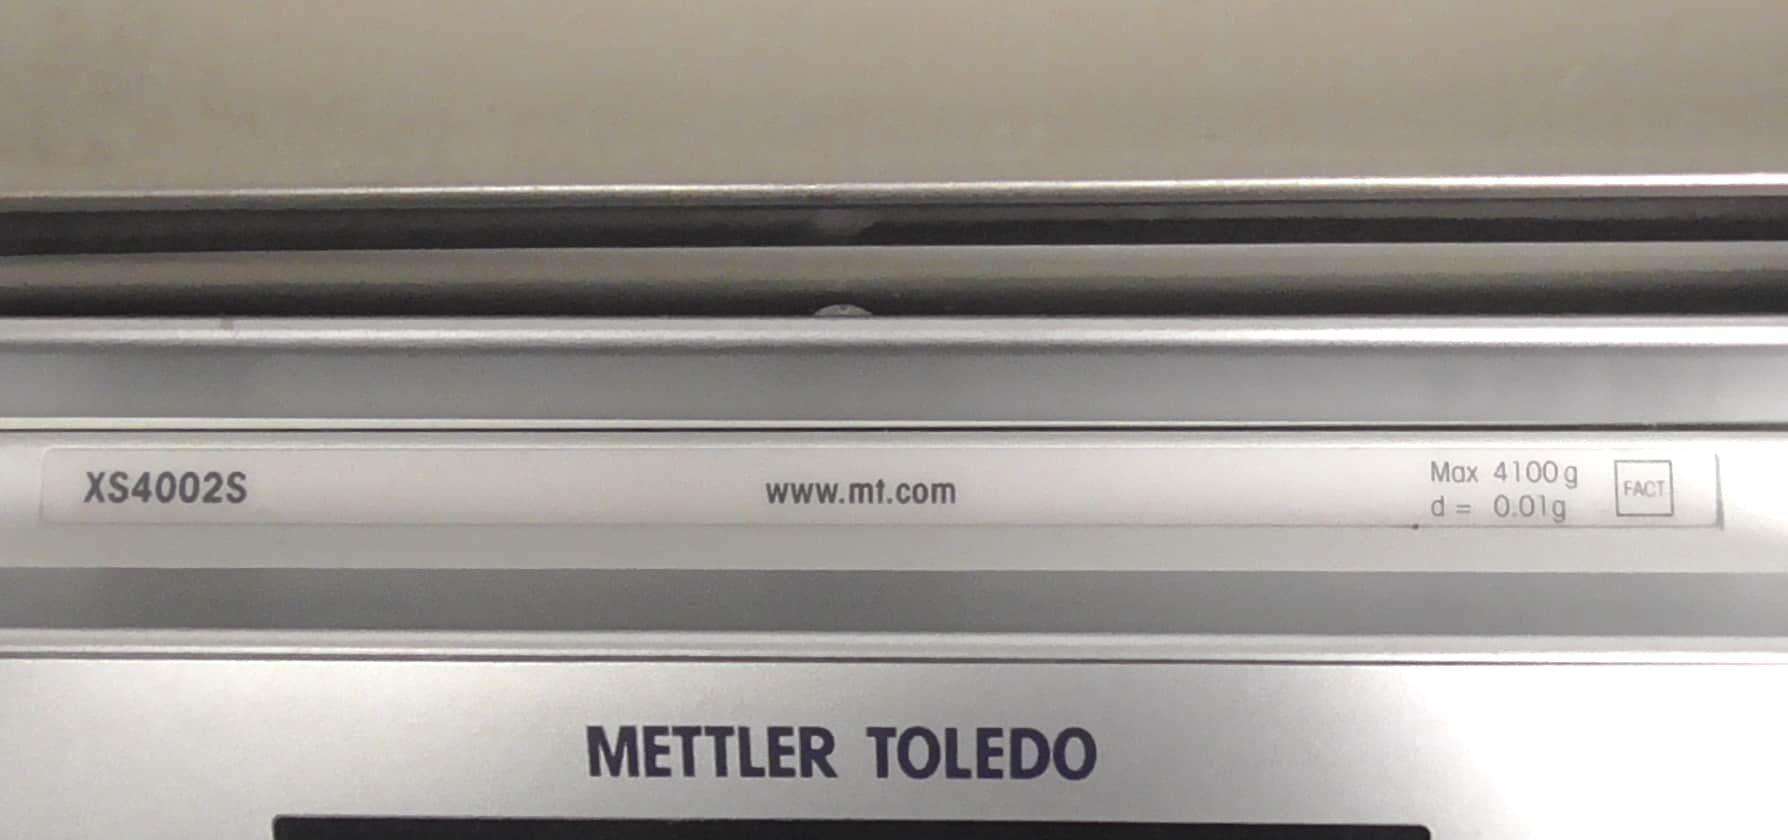 Mettler Toledo XS4002S Balance